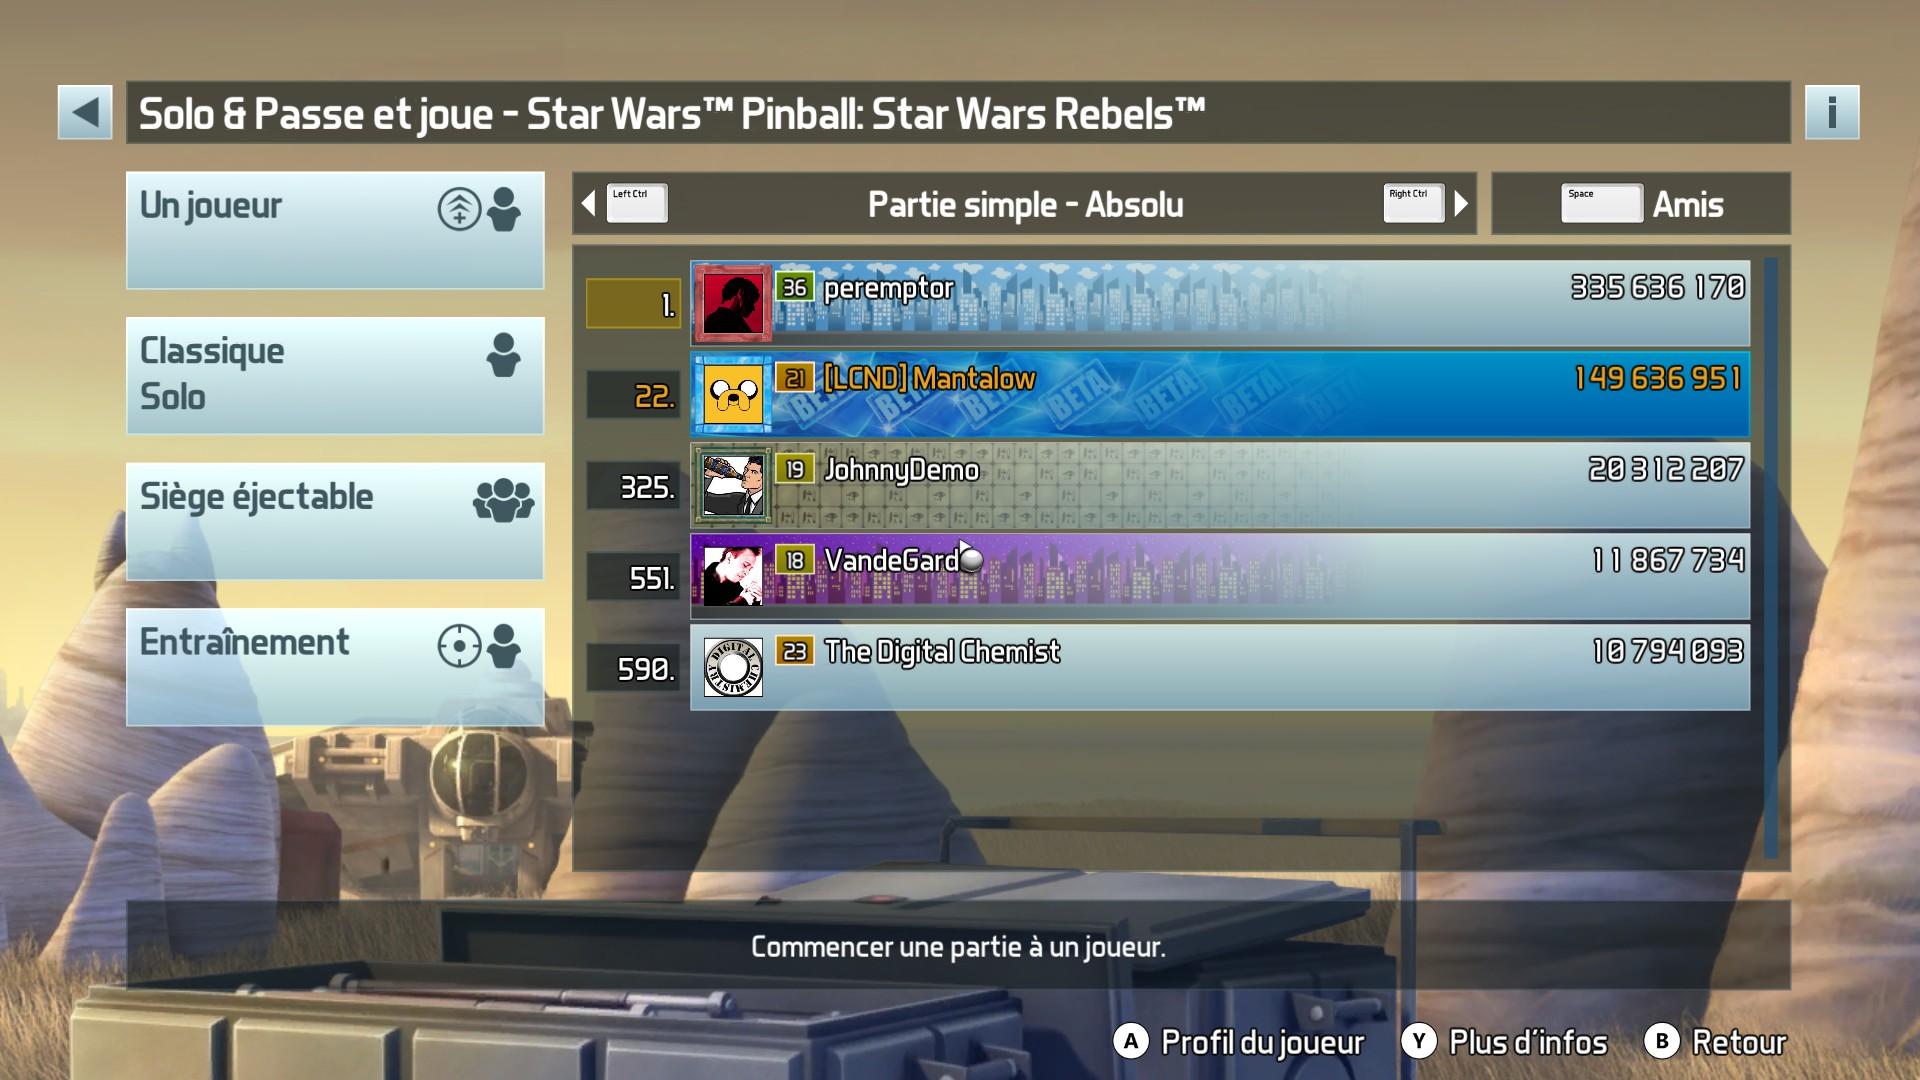 Pinball FX3: Star Wars Pinball: Star Wars Rebels 149,636,951 points